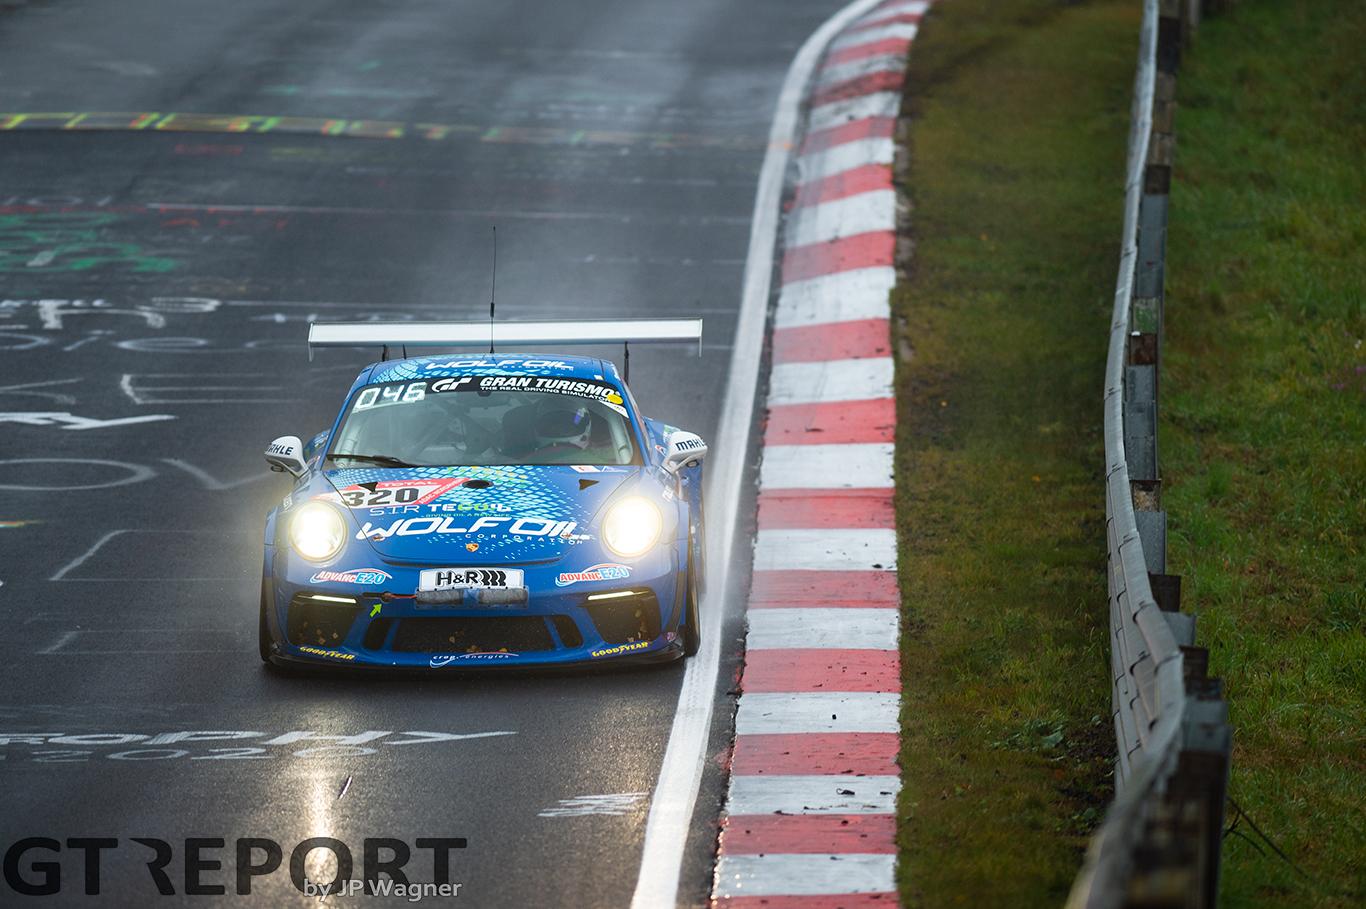 Nürburgring 24 Hours driver report: Thomas Kiefer – Race start